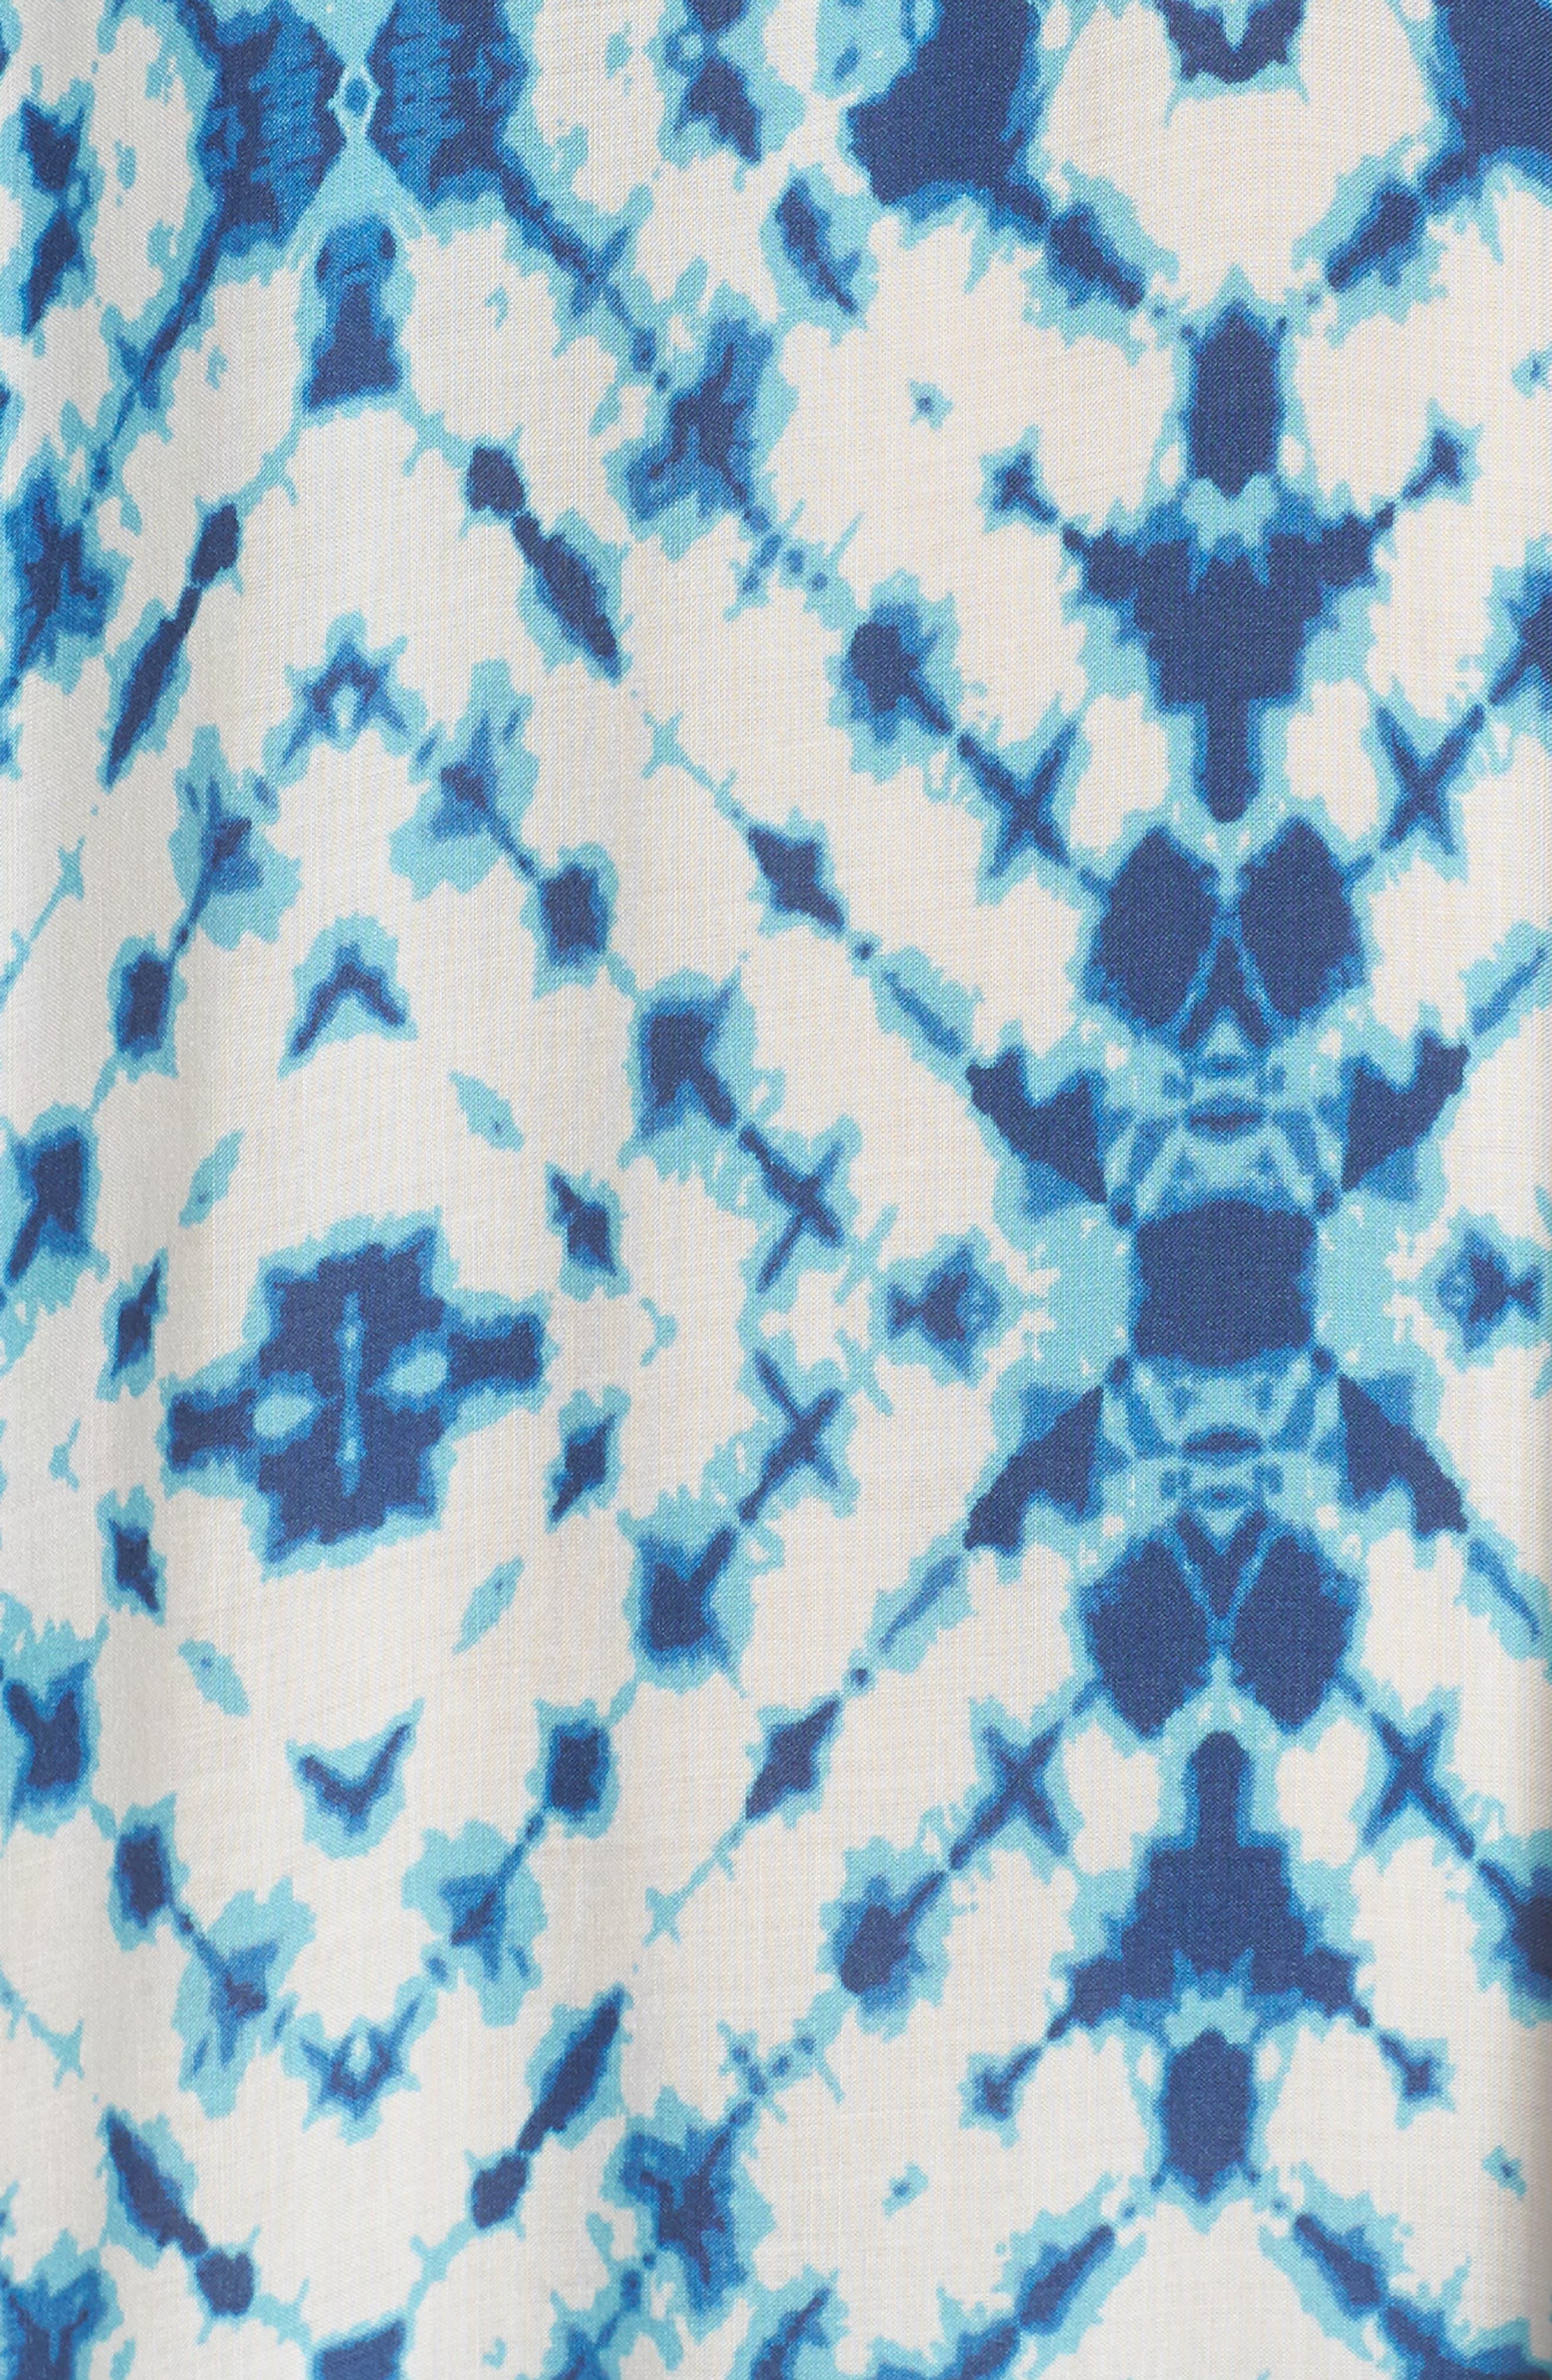 Tie Dye Cover-Up Caftan,                             Alternate thumbnail 5, color,                             400